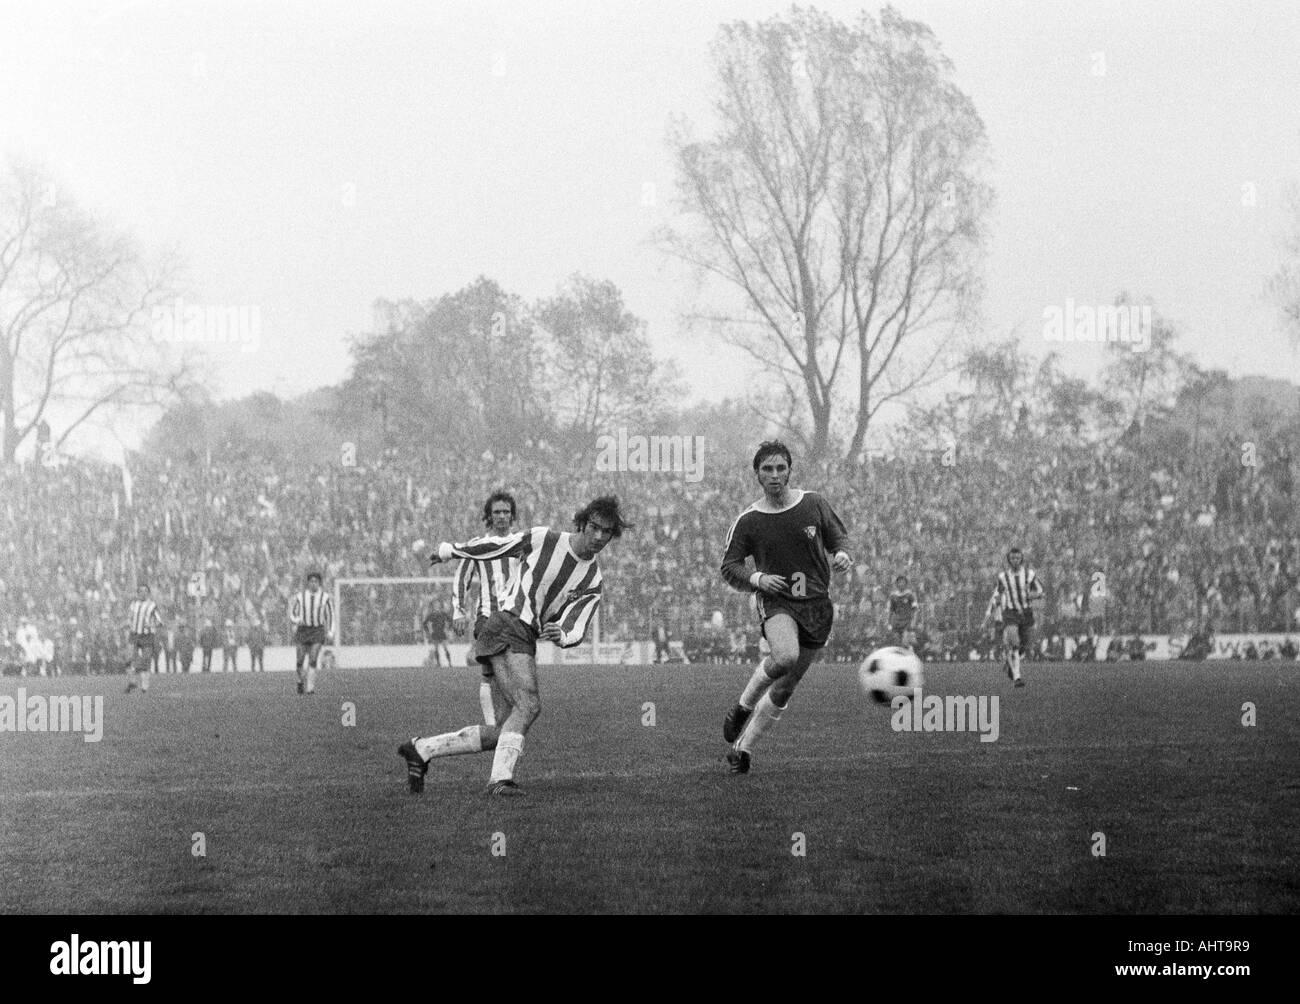 football, Bundesliga, 1971/1972, VfL Bochum versus 1. FC Cologne 1:5, Stadium at the Castroper Strasse in Bochum, scene of the match, f.l.t.r. Wolfgang Overath, Harald Konopka (both Koeln), Werner Balte (Bochum) - Stock Image